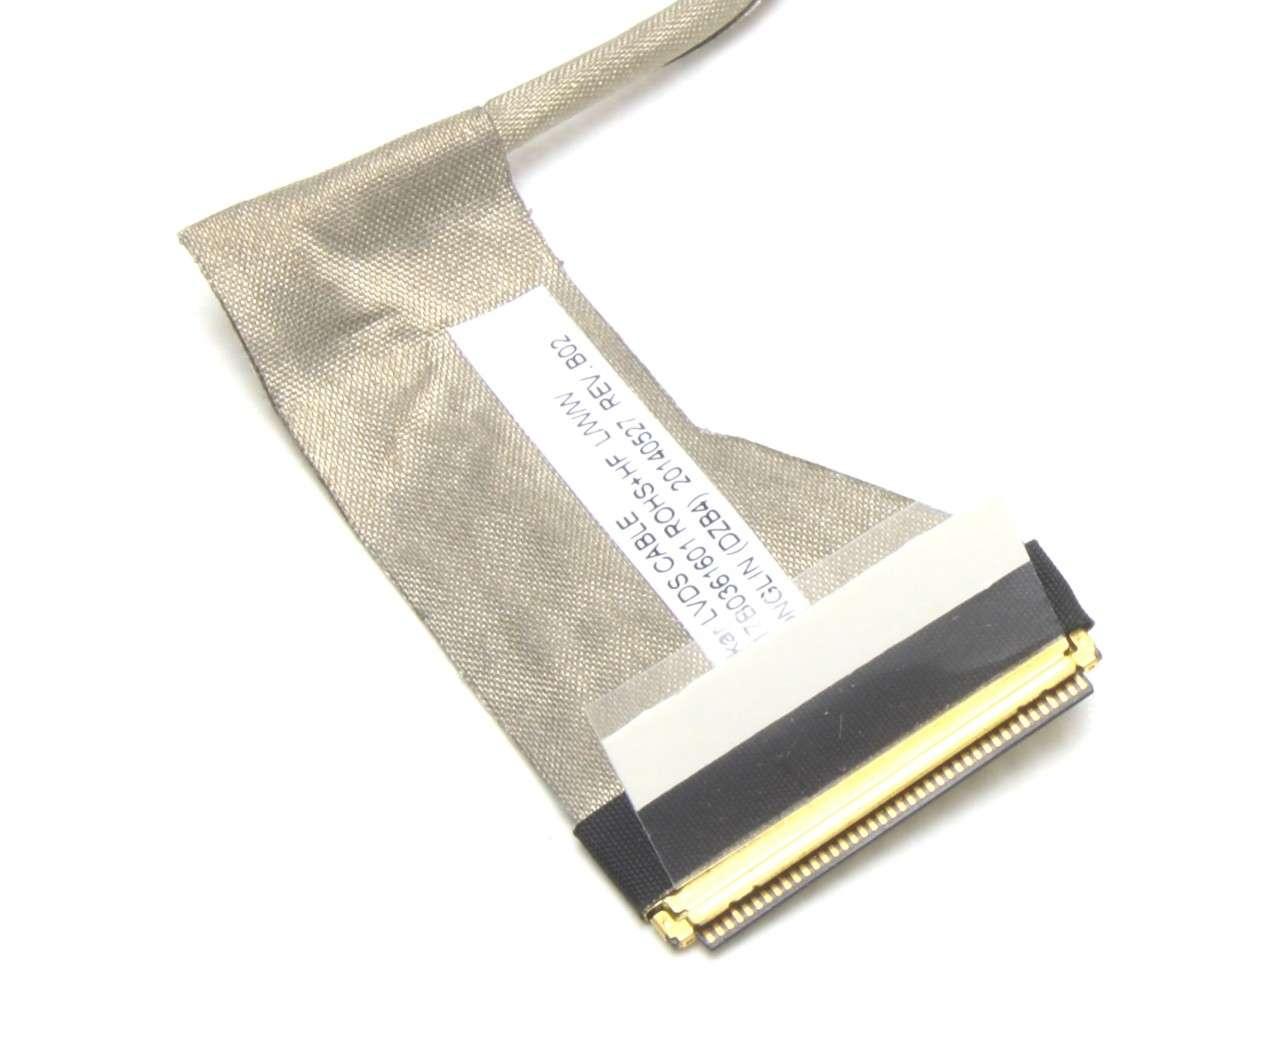 Cablu video LVDS Toshiba 6017B0361601 Part Number 6017B0361601 imagine powerlaptop.ro 2021